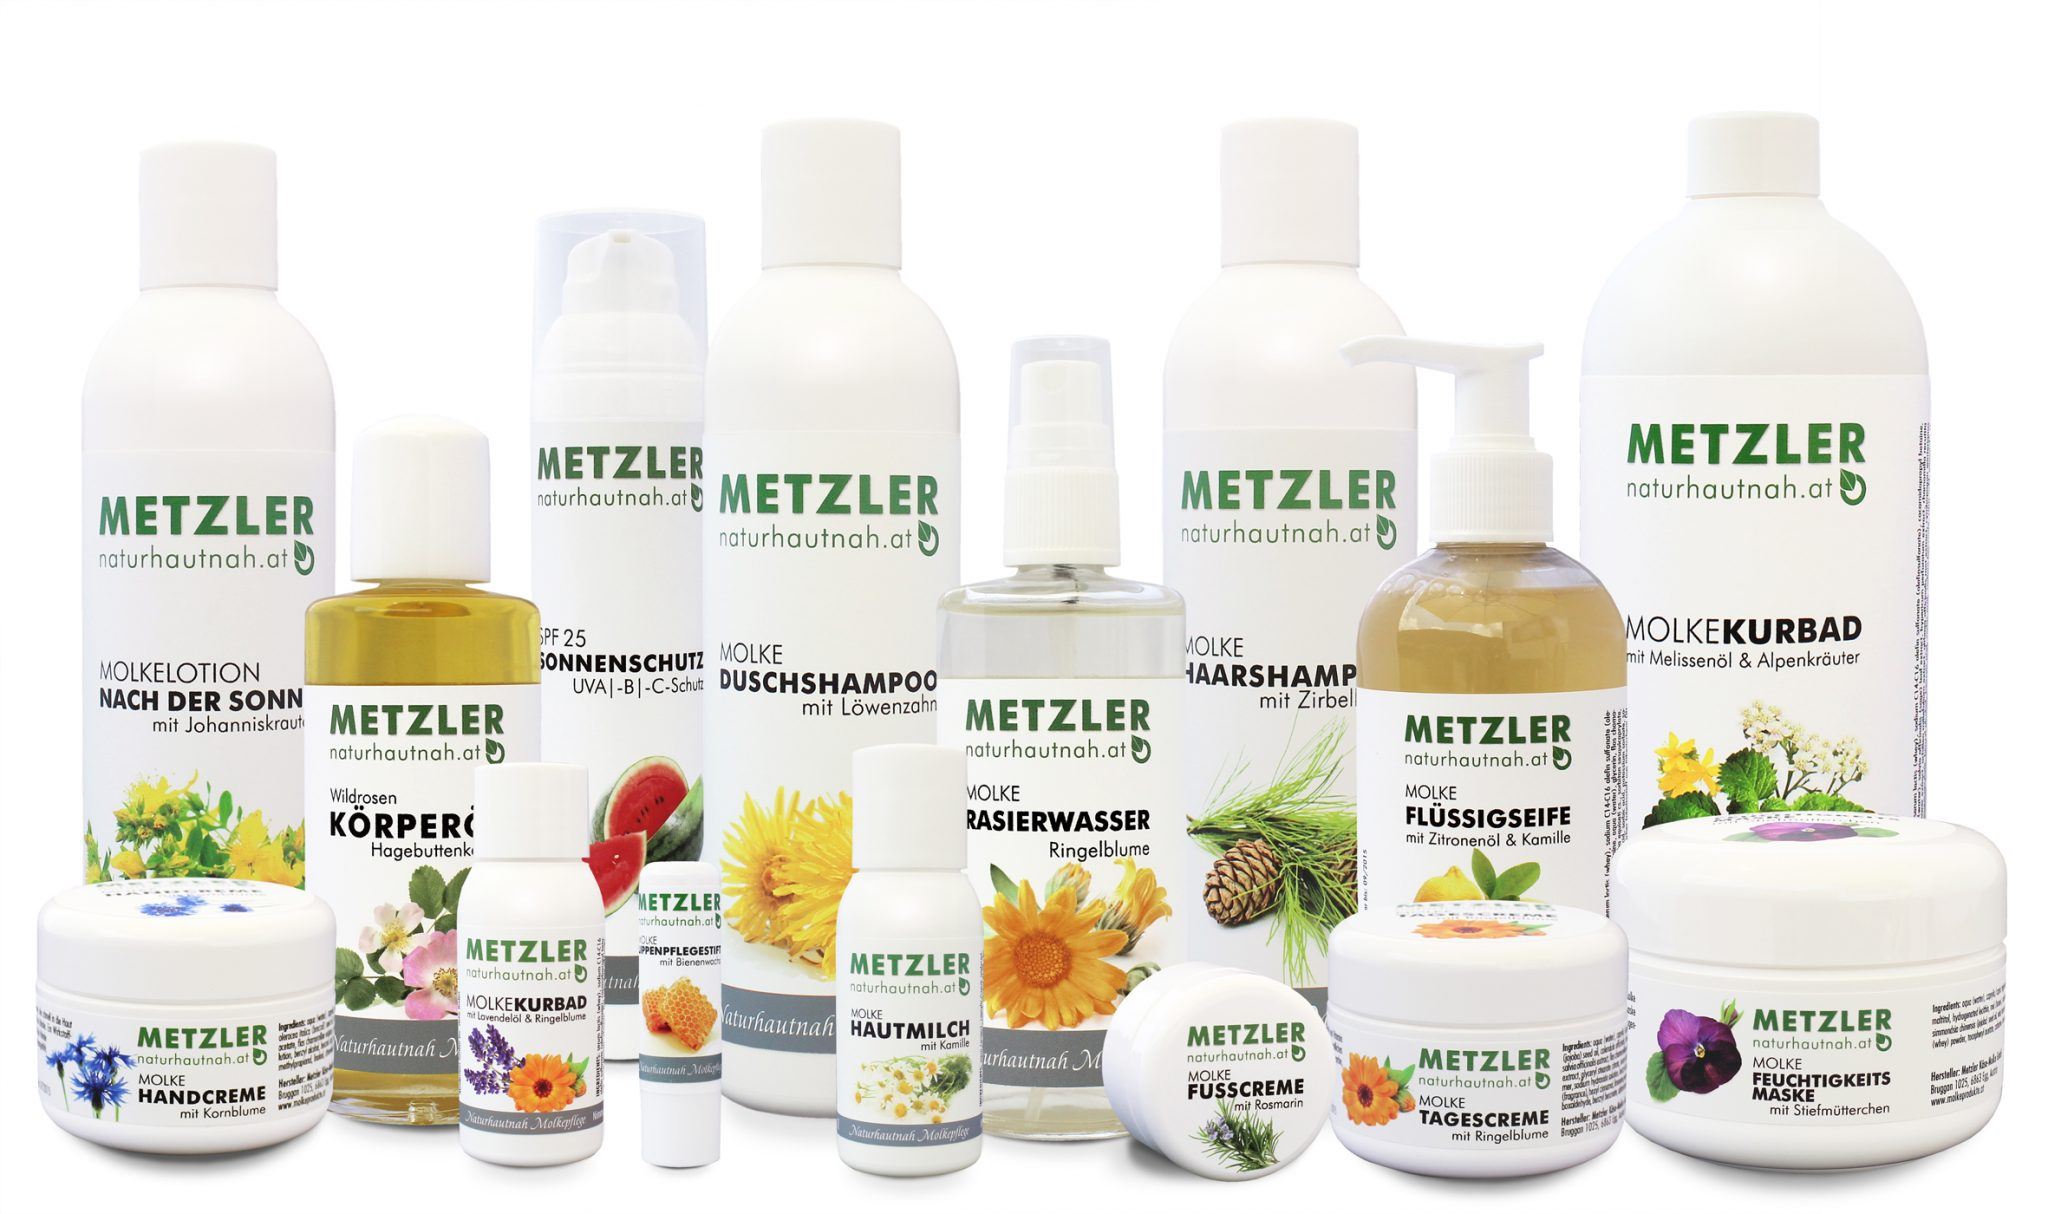 Naturhautnah Kosmetiksortiment Bregenzerwald Hotel Krone Au